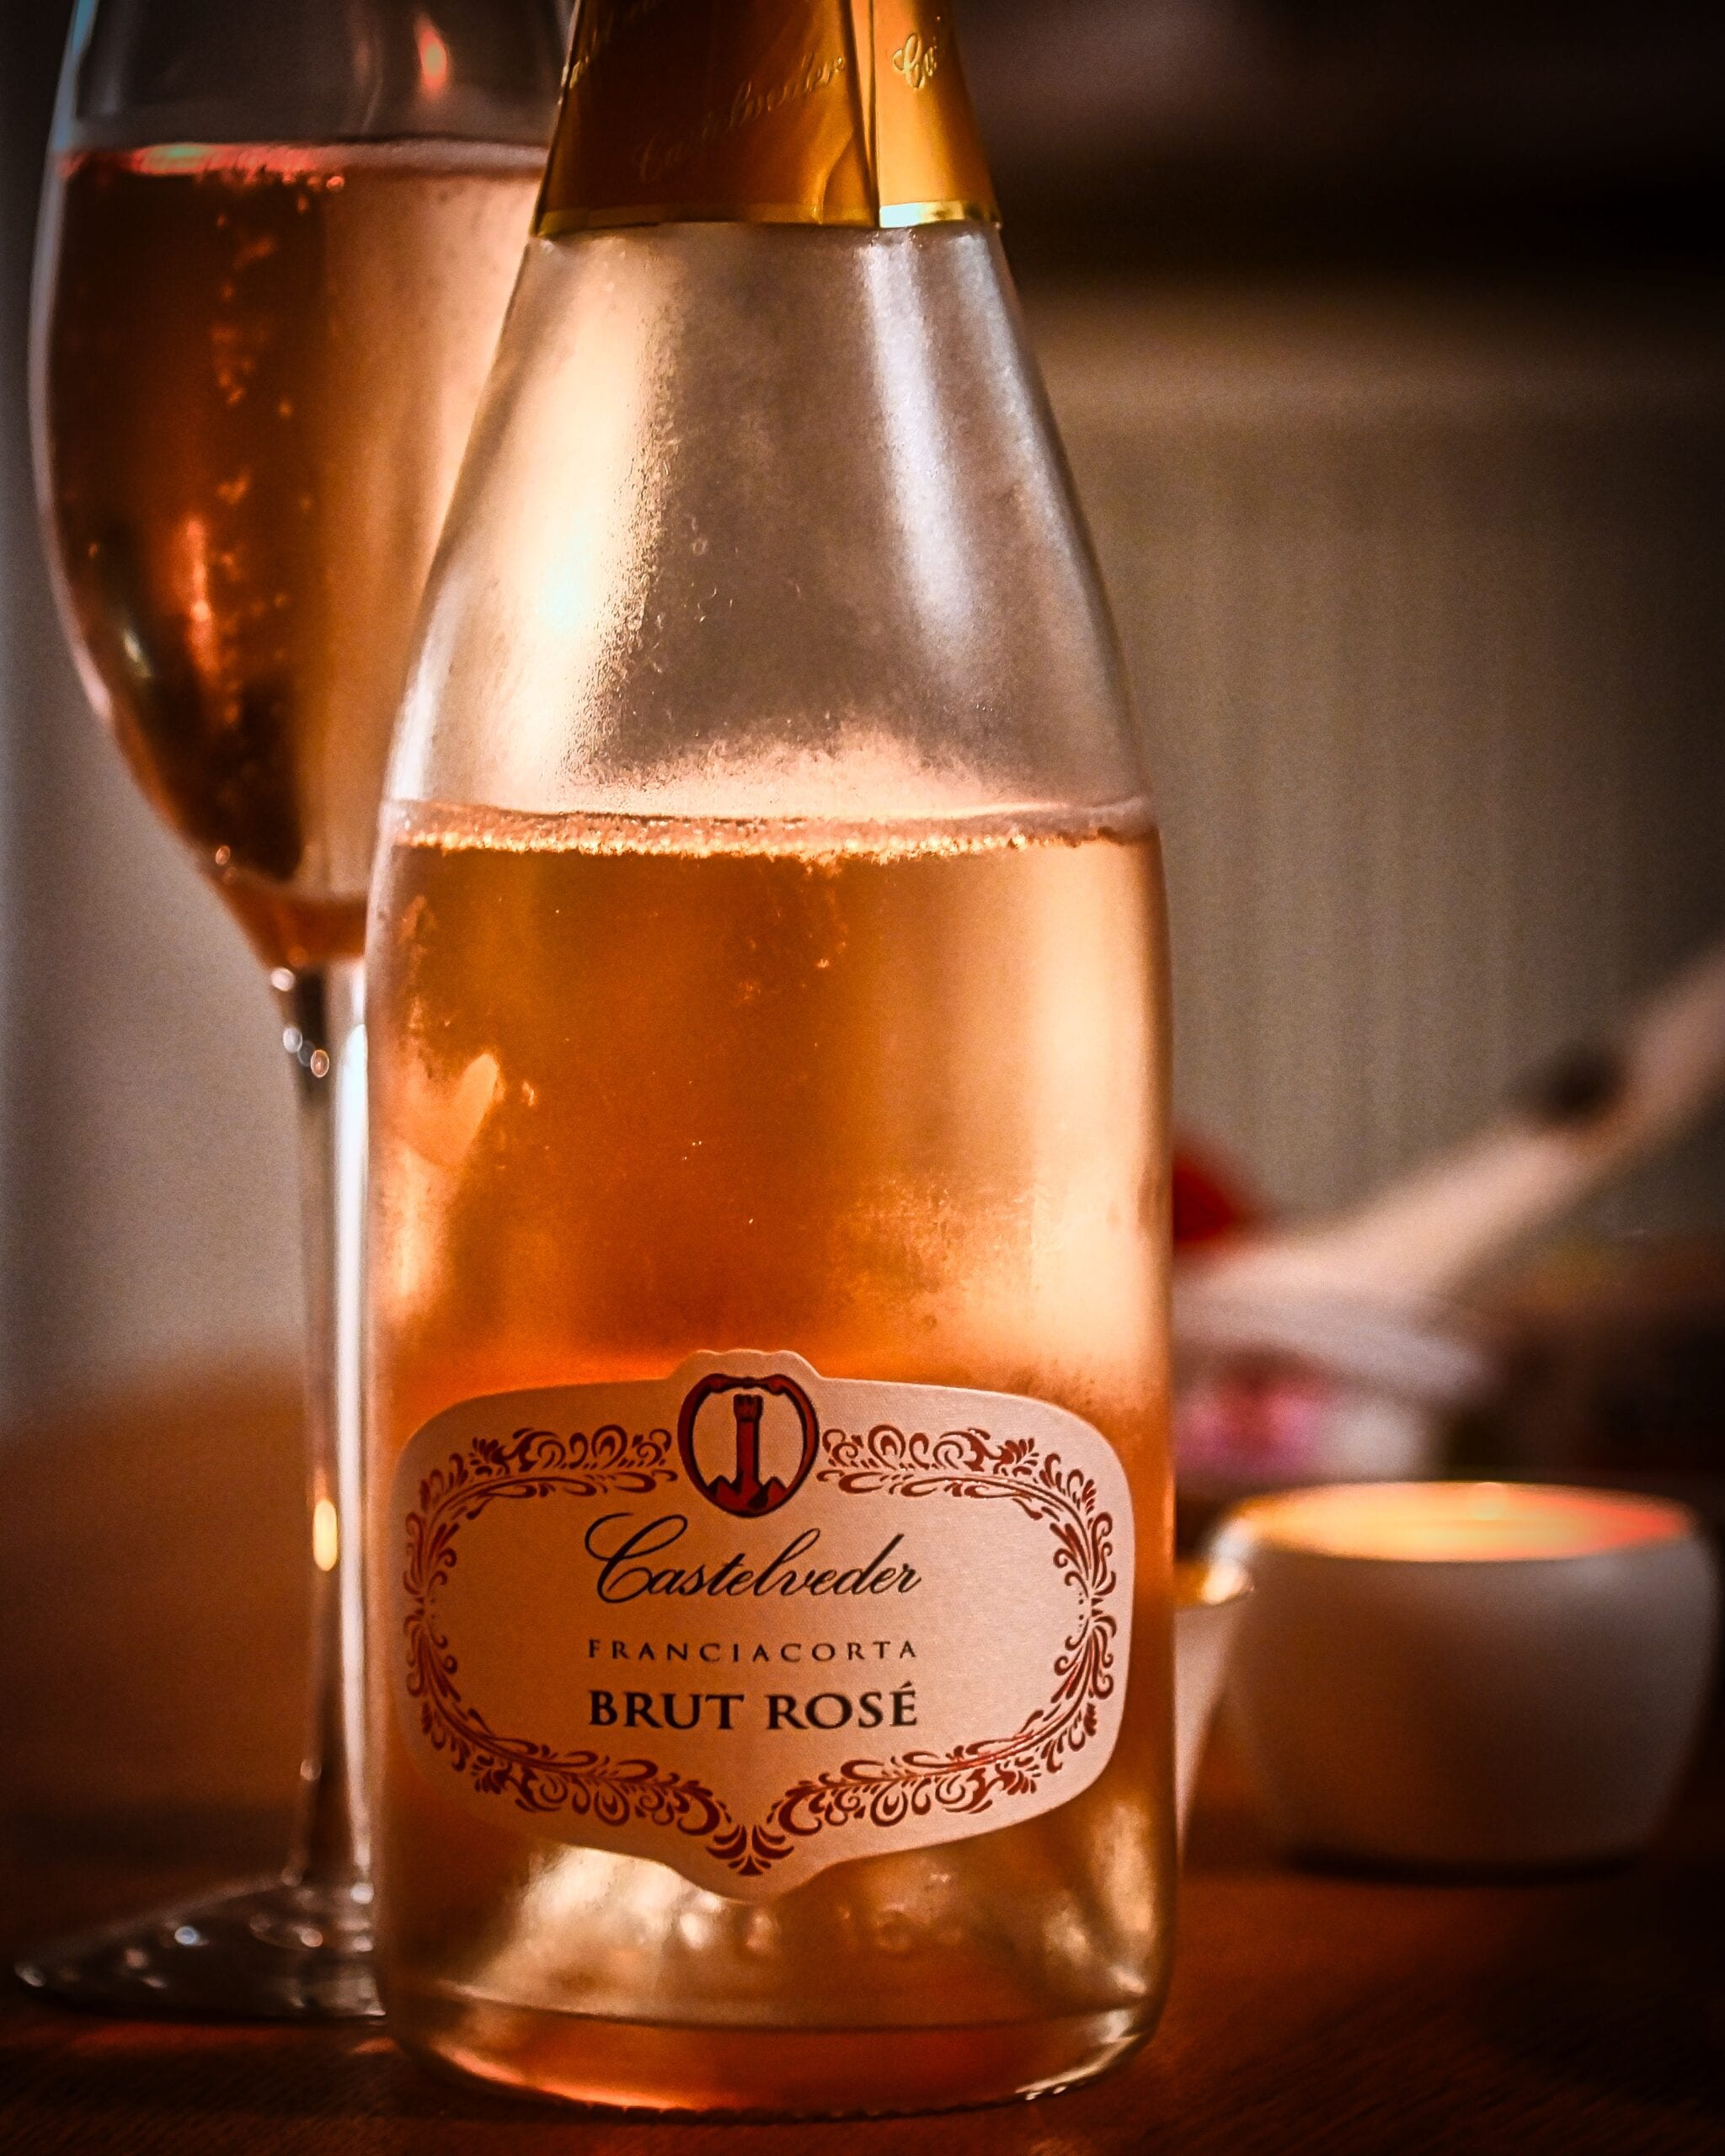 Castelveder Franciacorta Brut Rosé